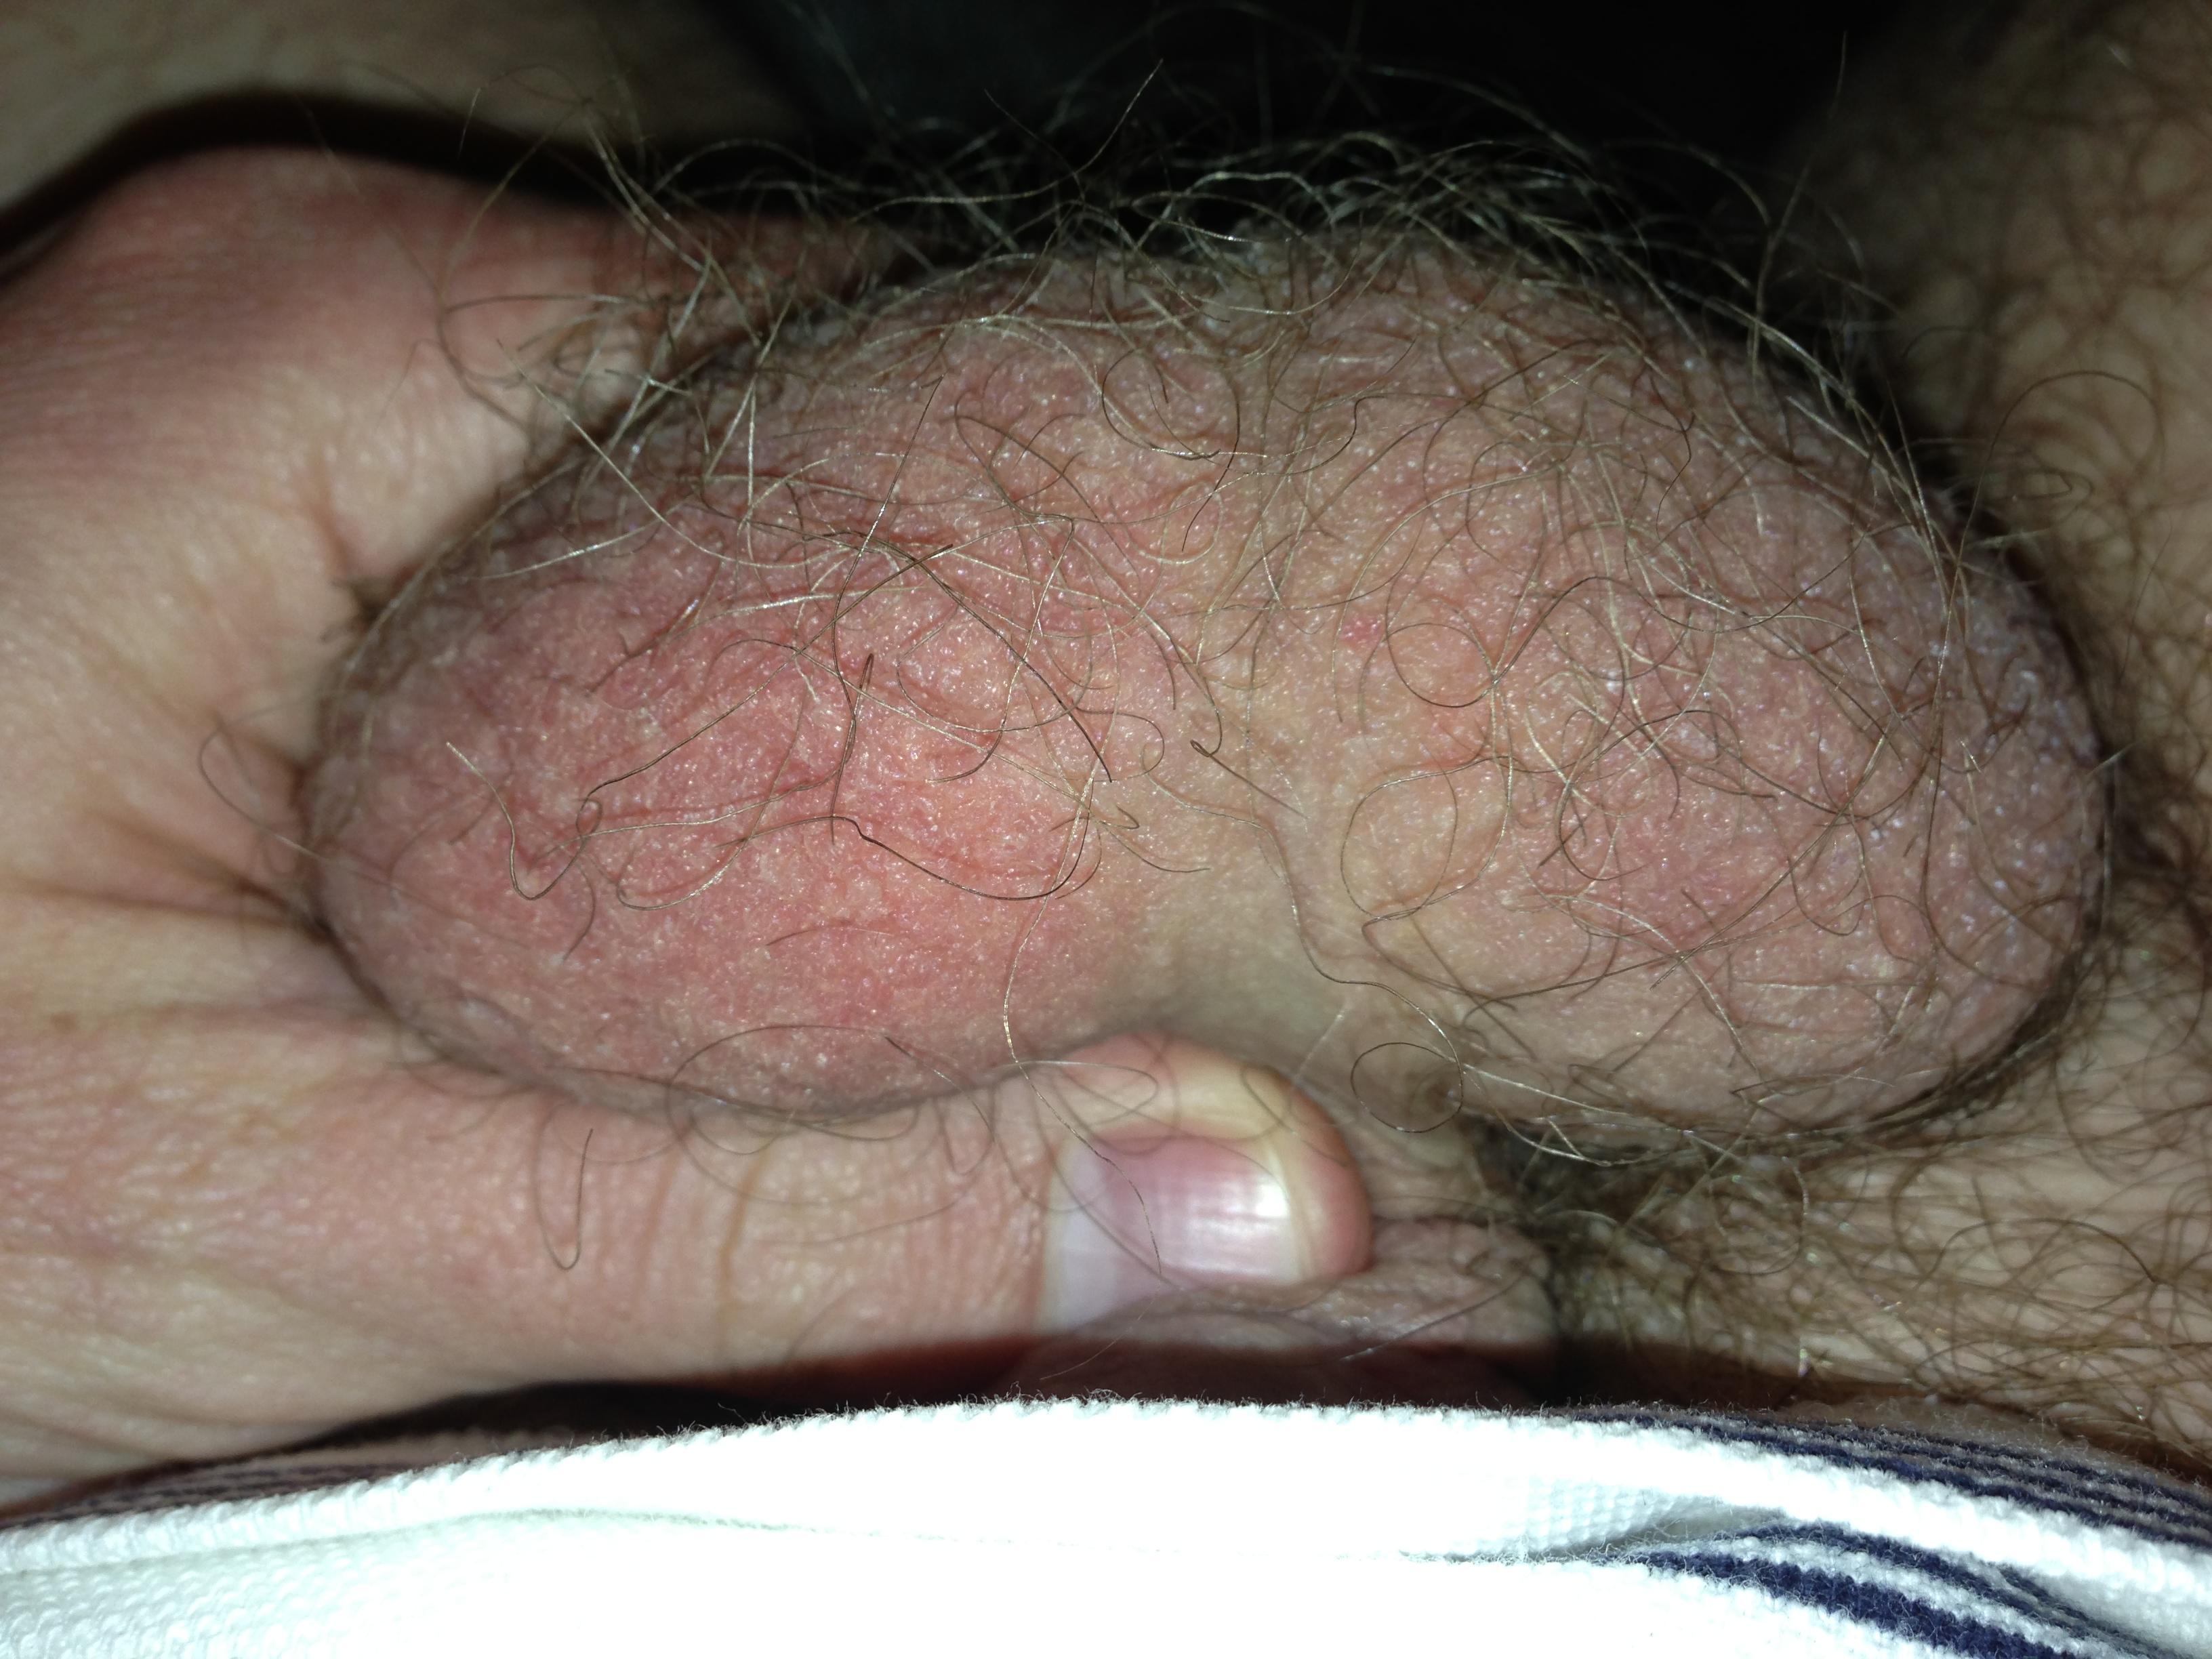 Herpes Symptoms in Men - Male Herpes Signs - STD Test Express